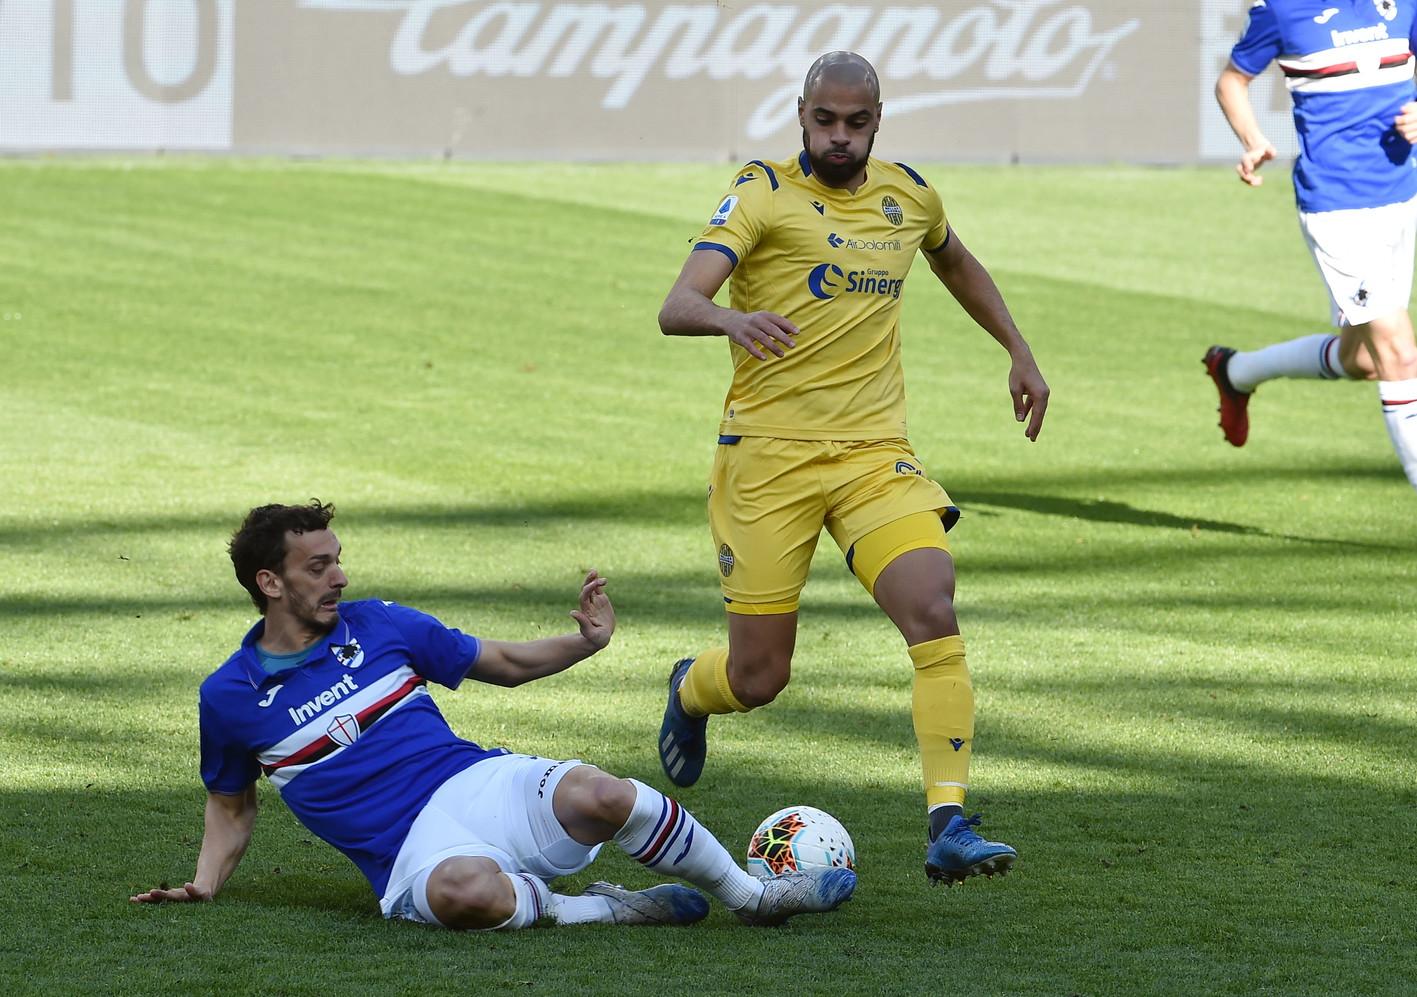 Amrabat dal Verona alla Fiorentina per 20 milioni